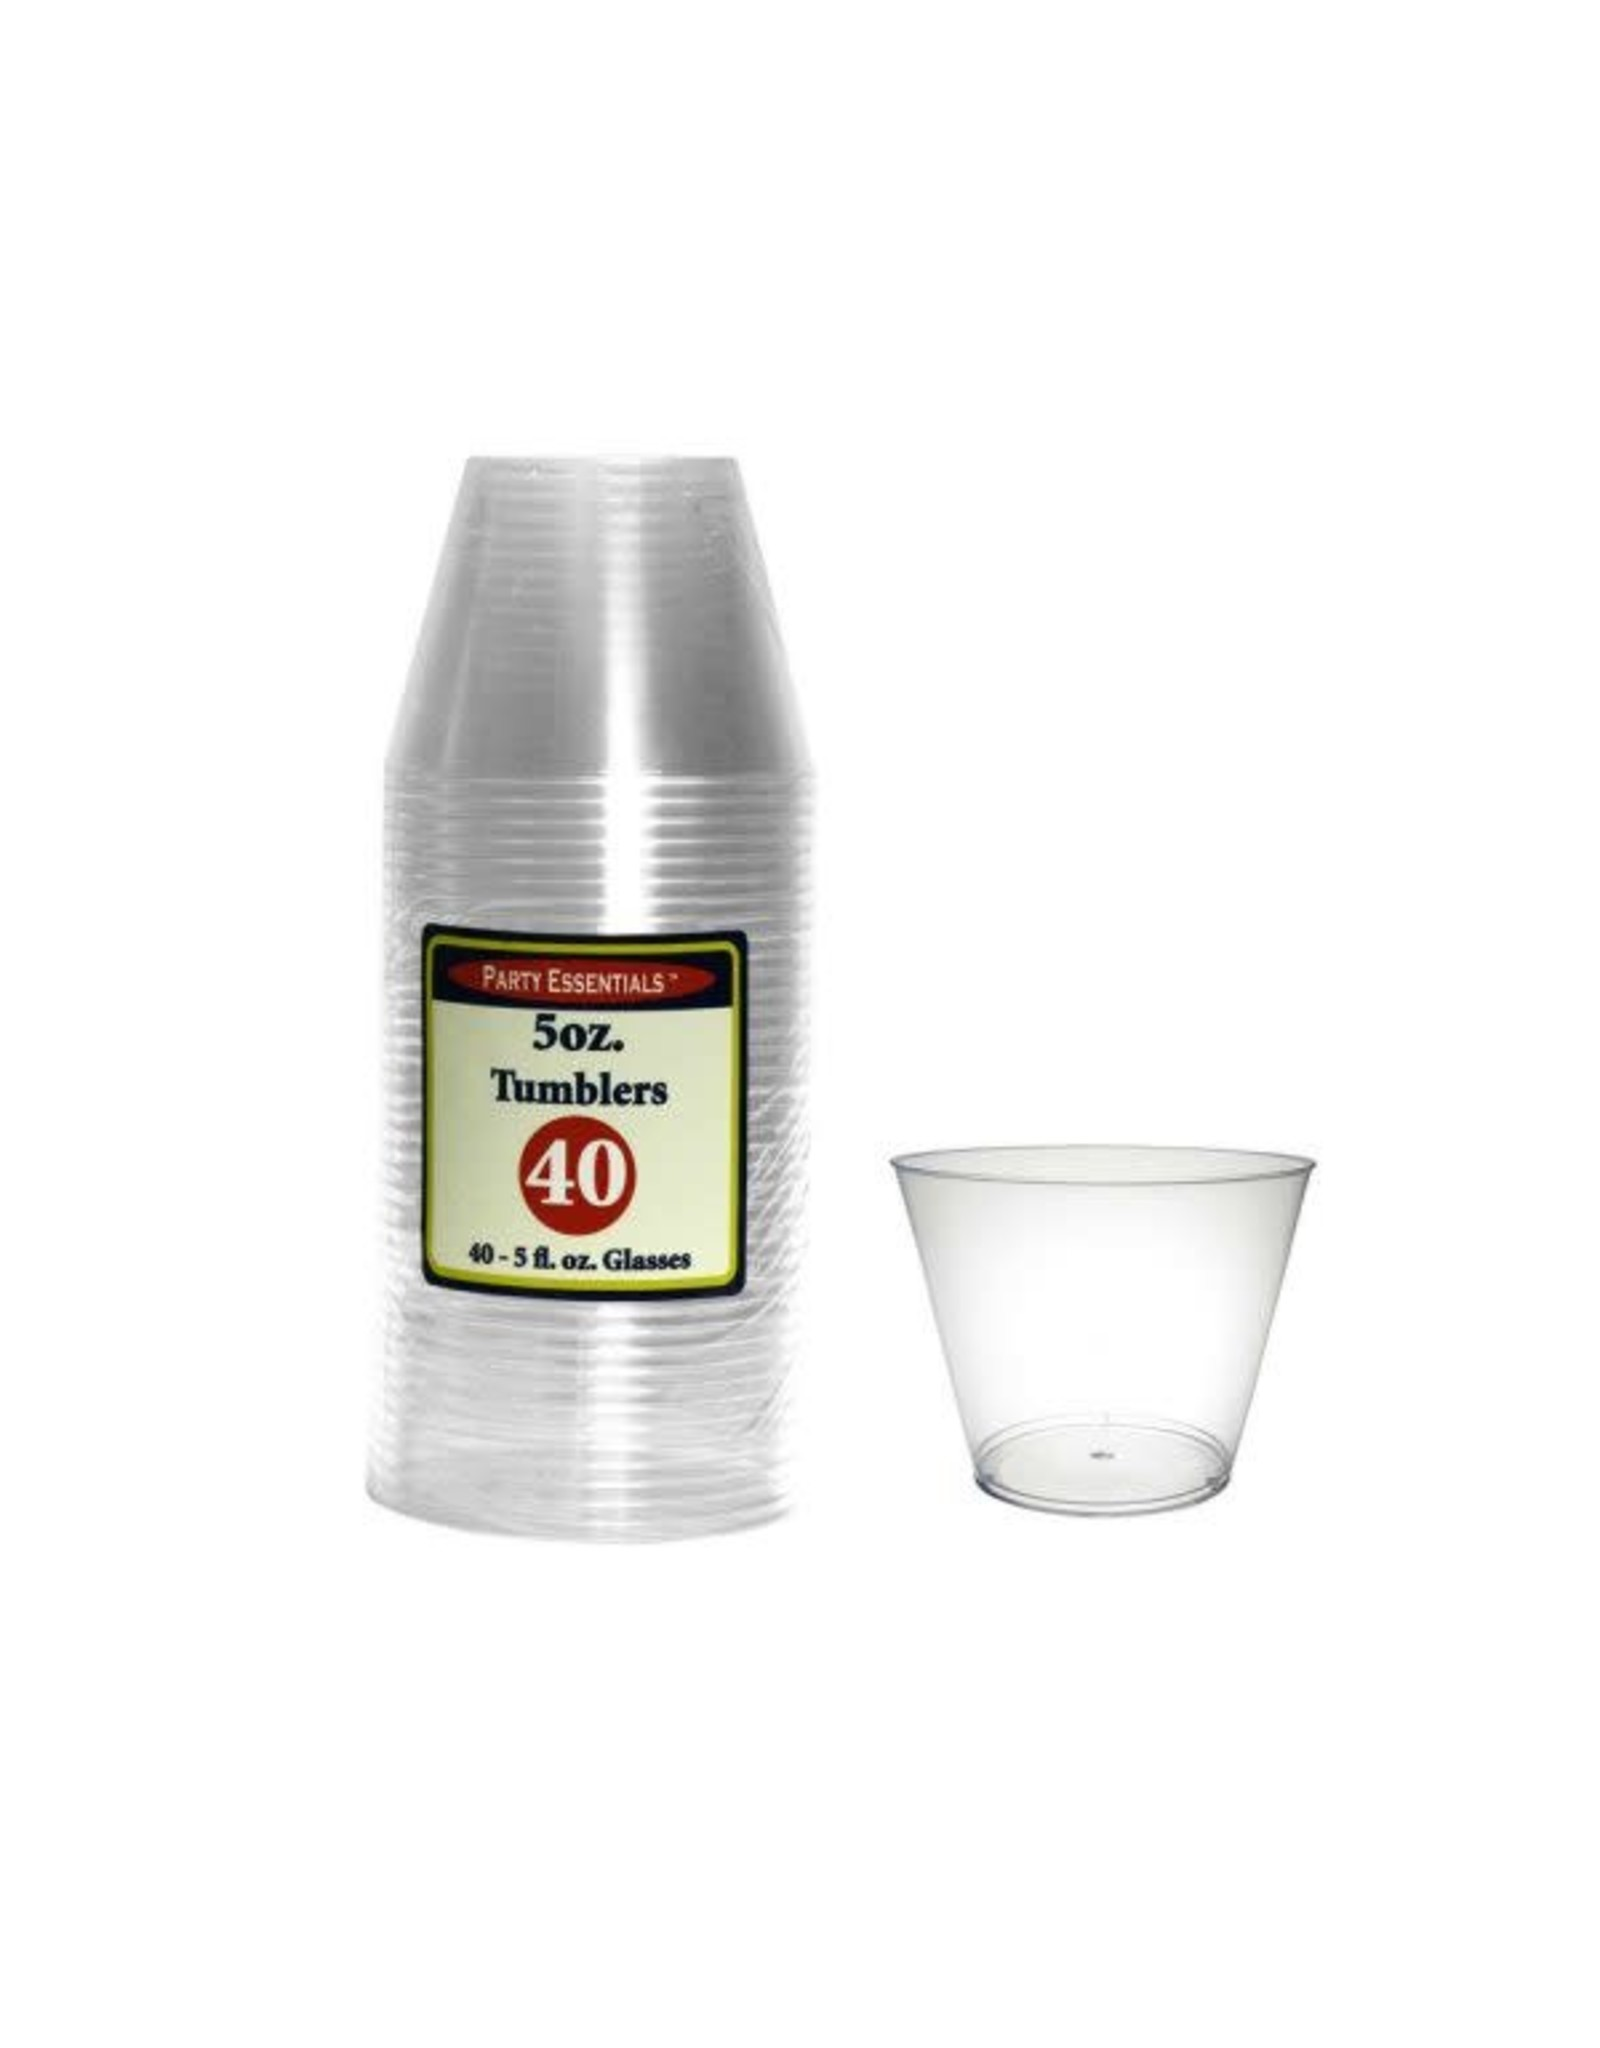 Party Essentials 5oz Clear Tumbler - 40ct.